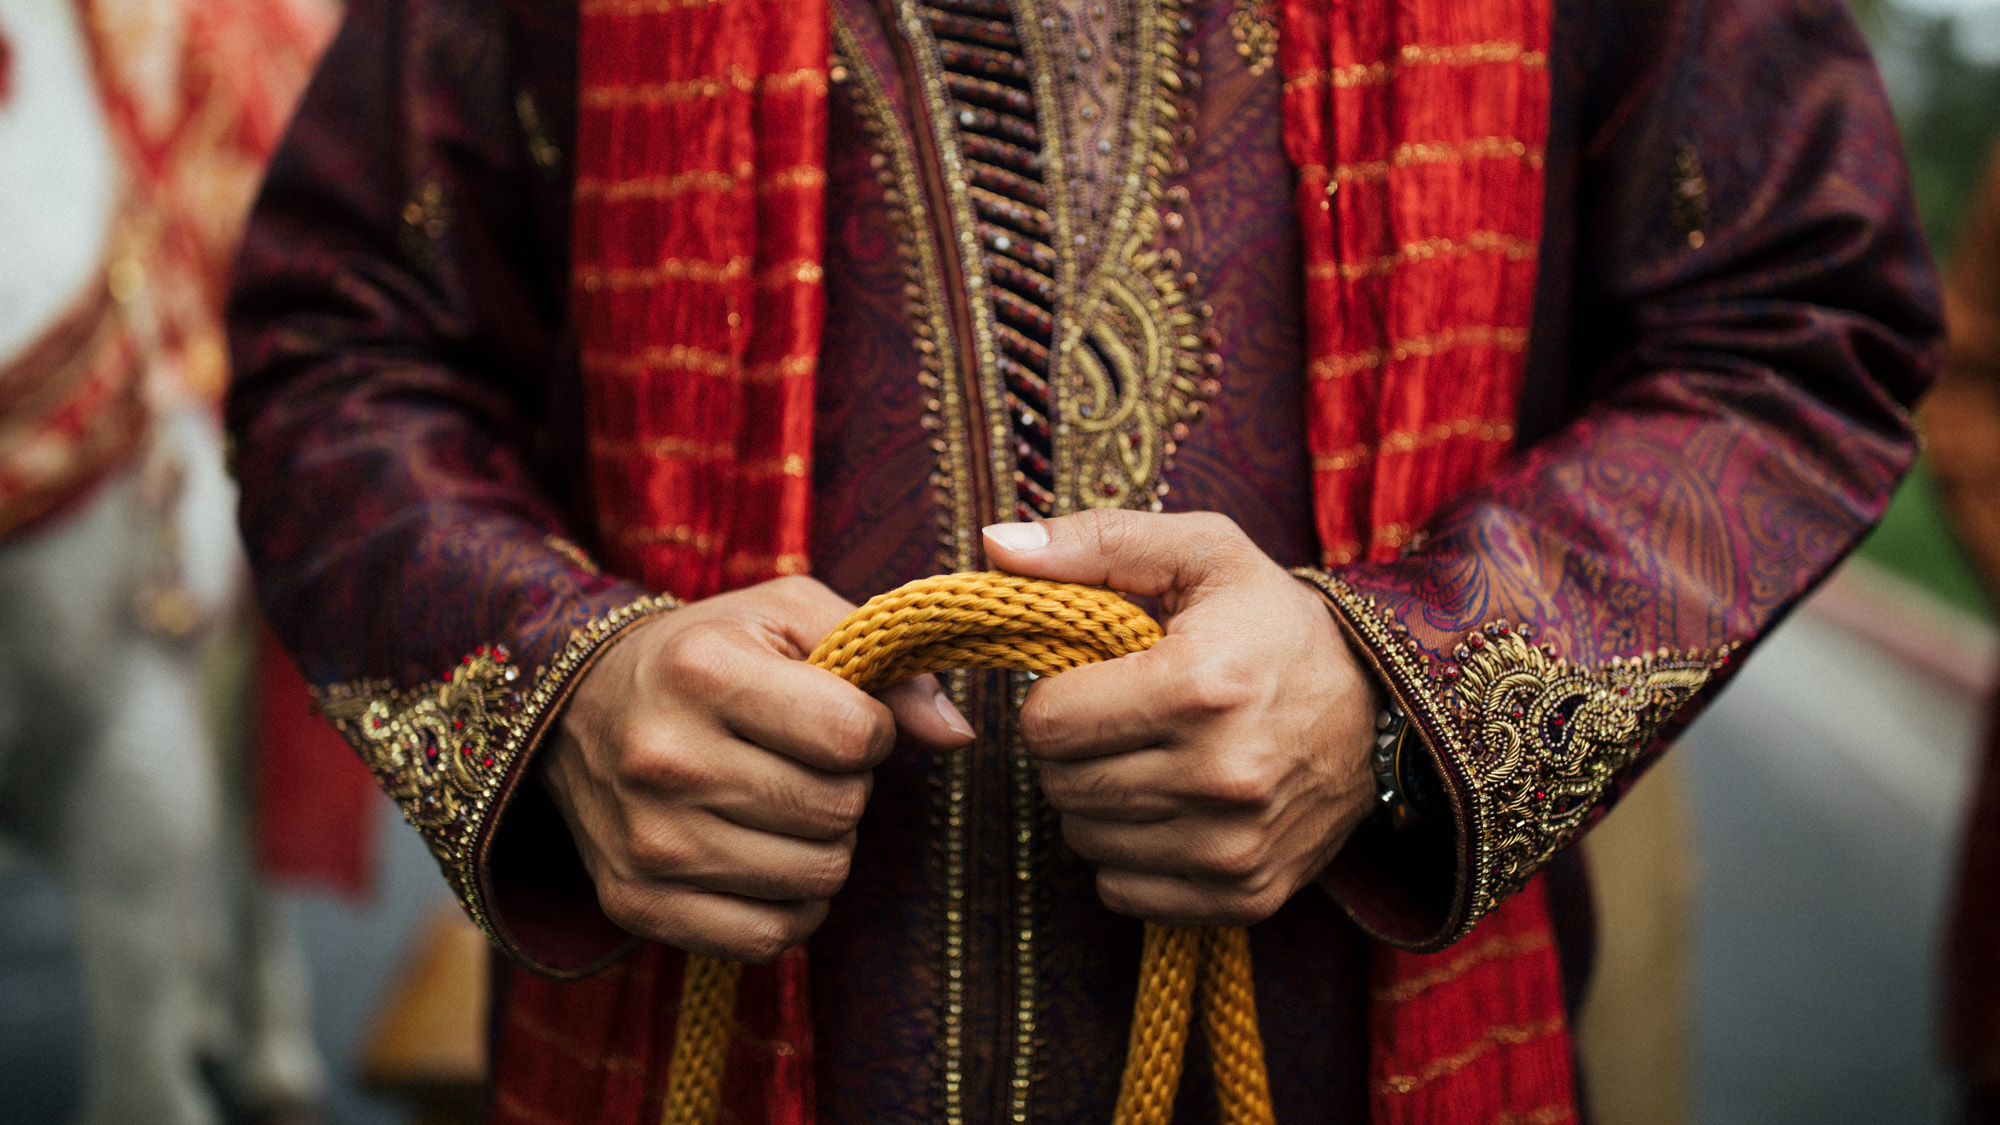 anu_maneesh_alec_vanderboom_Indian_wedding_photography-0069.jpg